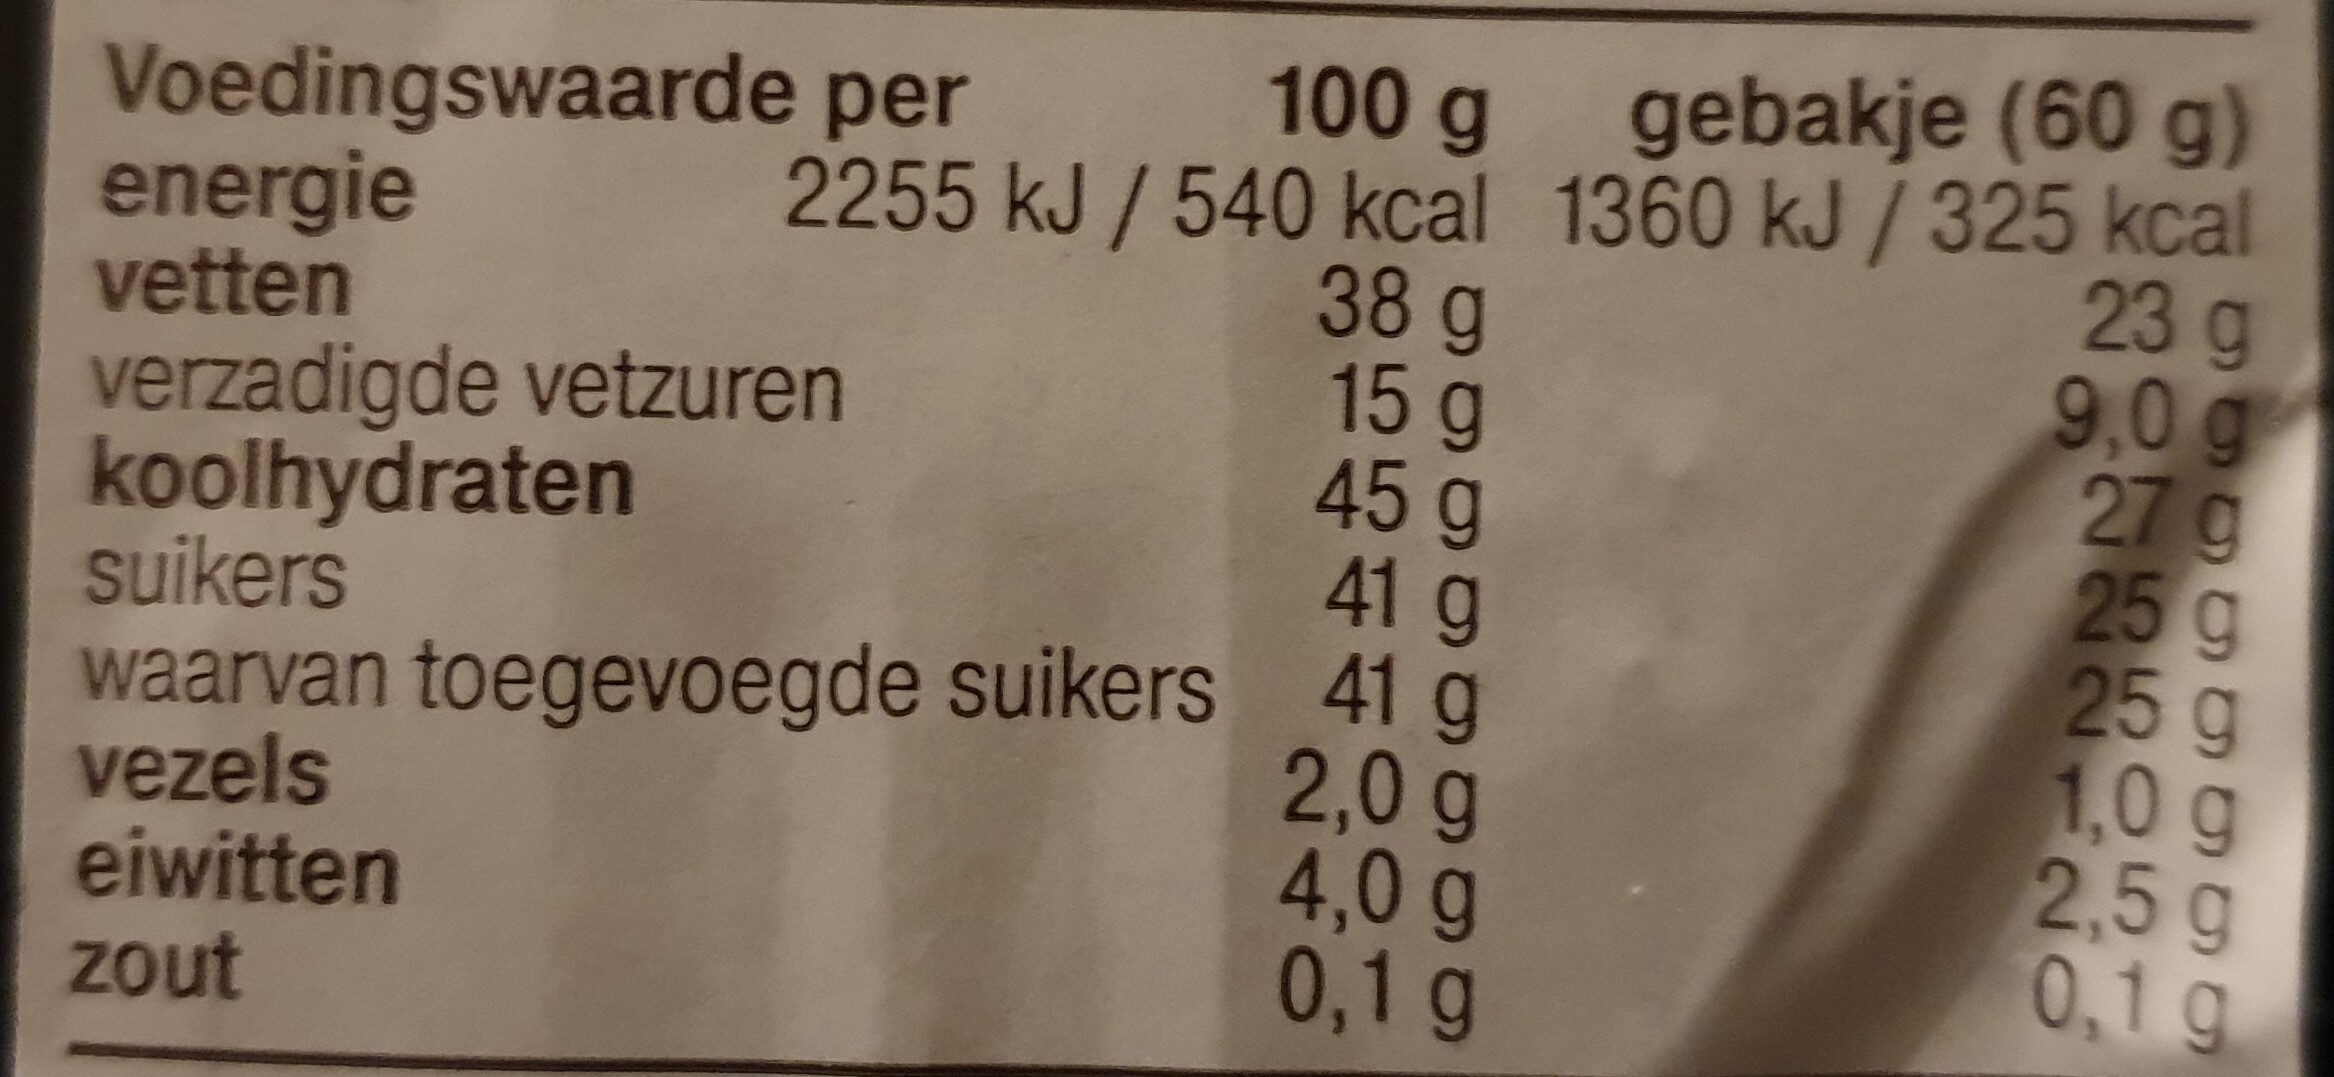 Mokkagebakjes - Voedingswaarden - nl